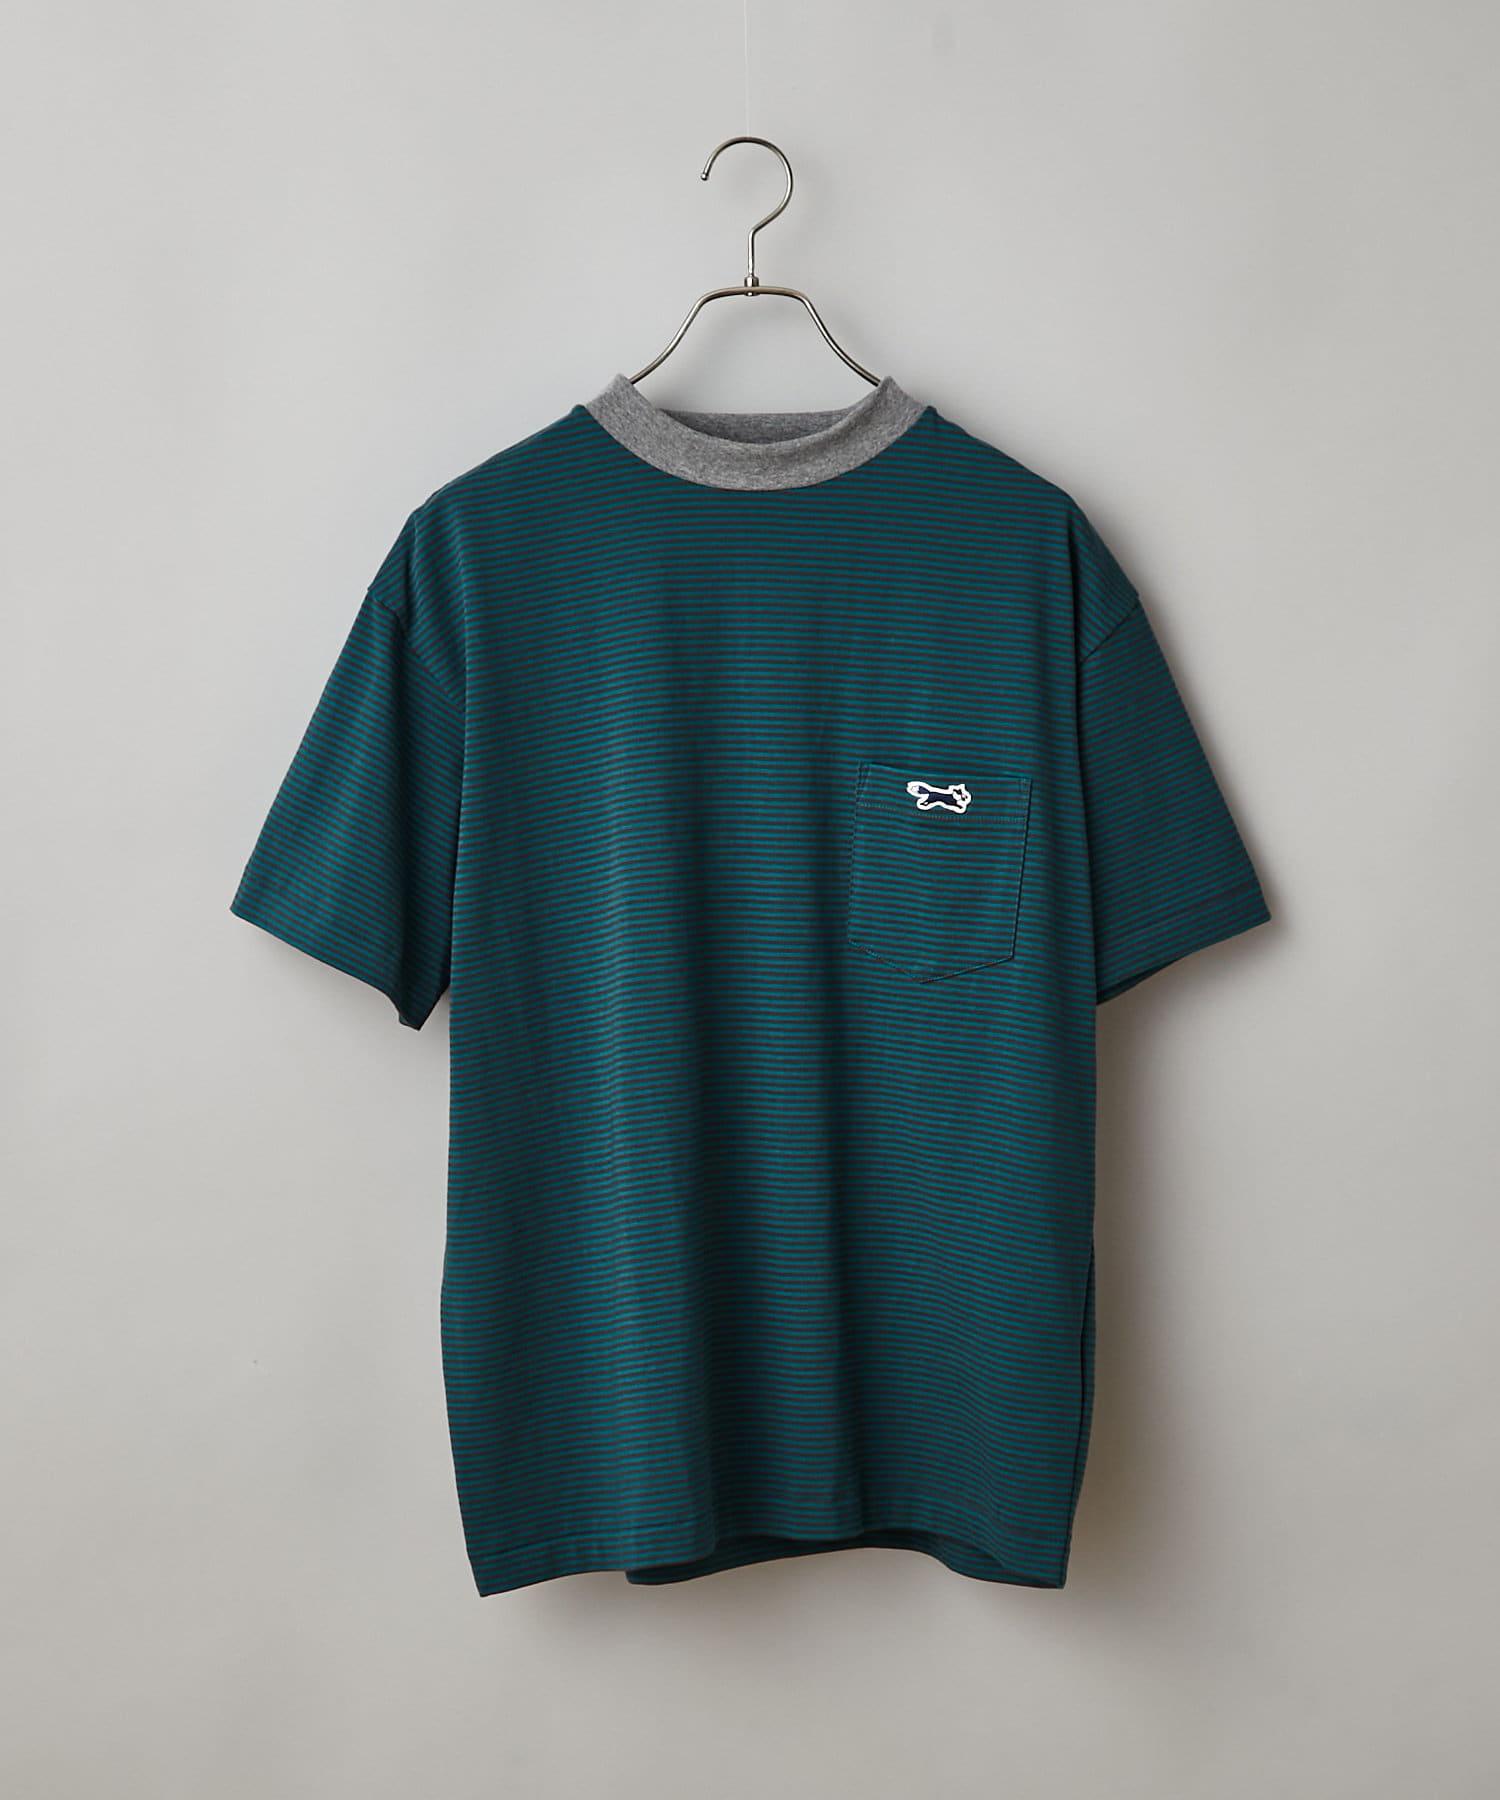 CIAOPANIC(チャオパニック) メンズ 【PENNEYS/ぺニーズ】別注フォックスロゴボーダーTシャツ グリーン